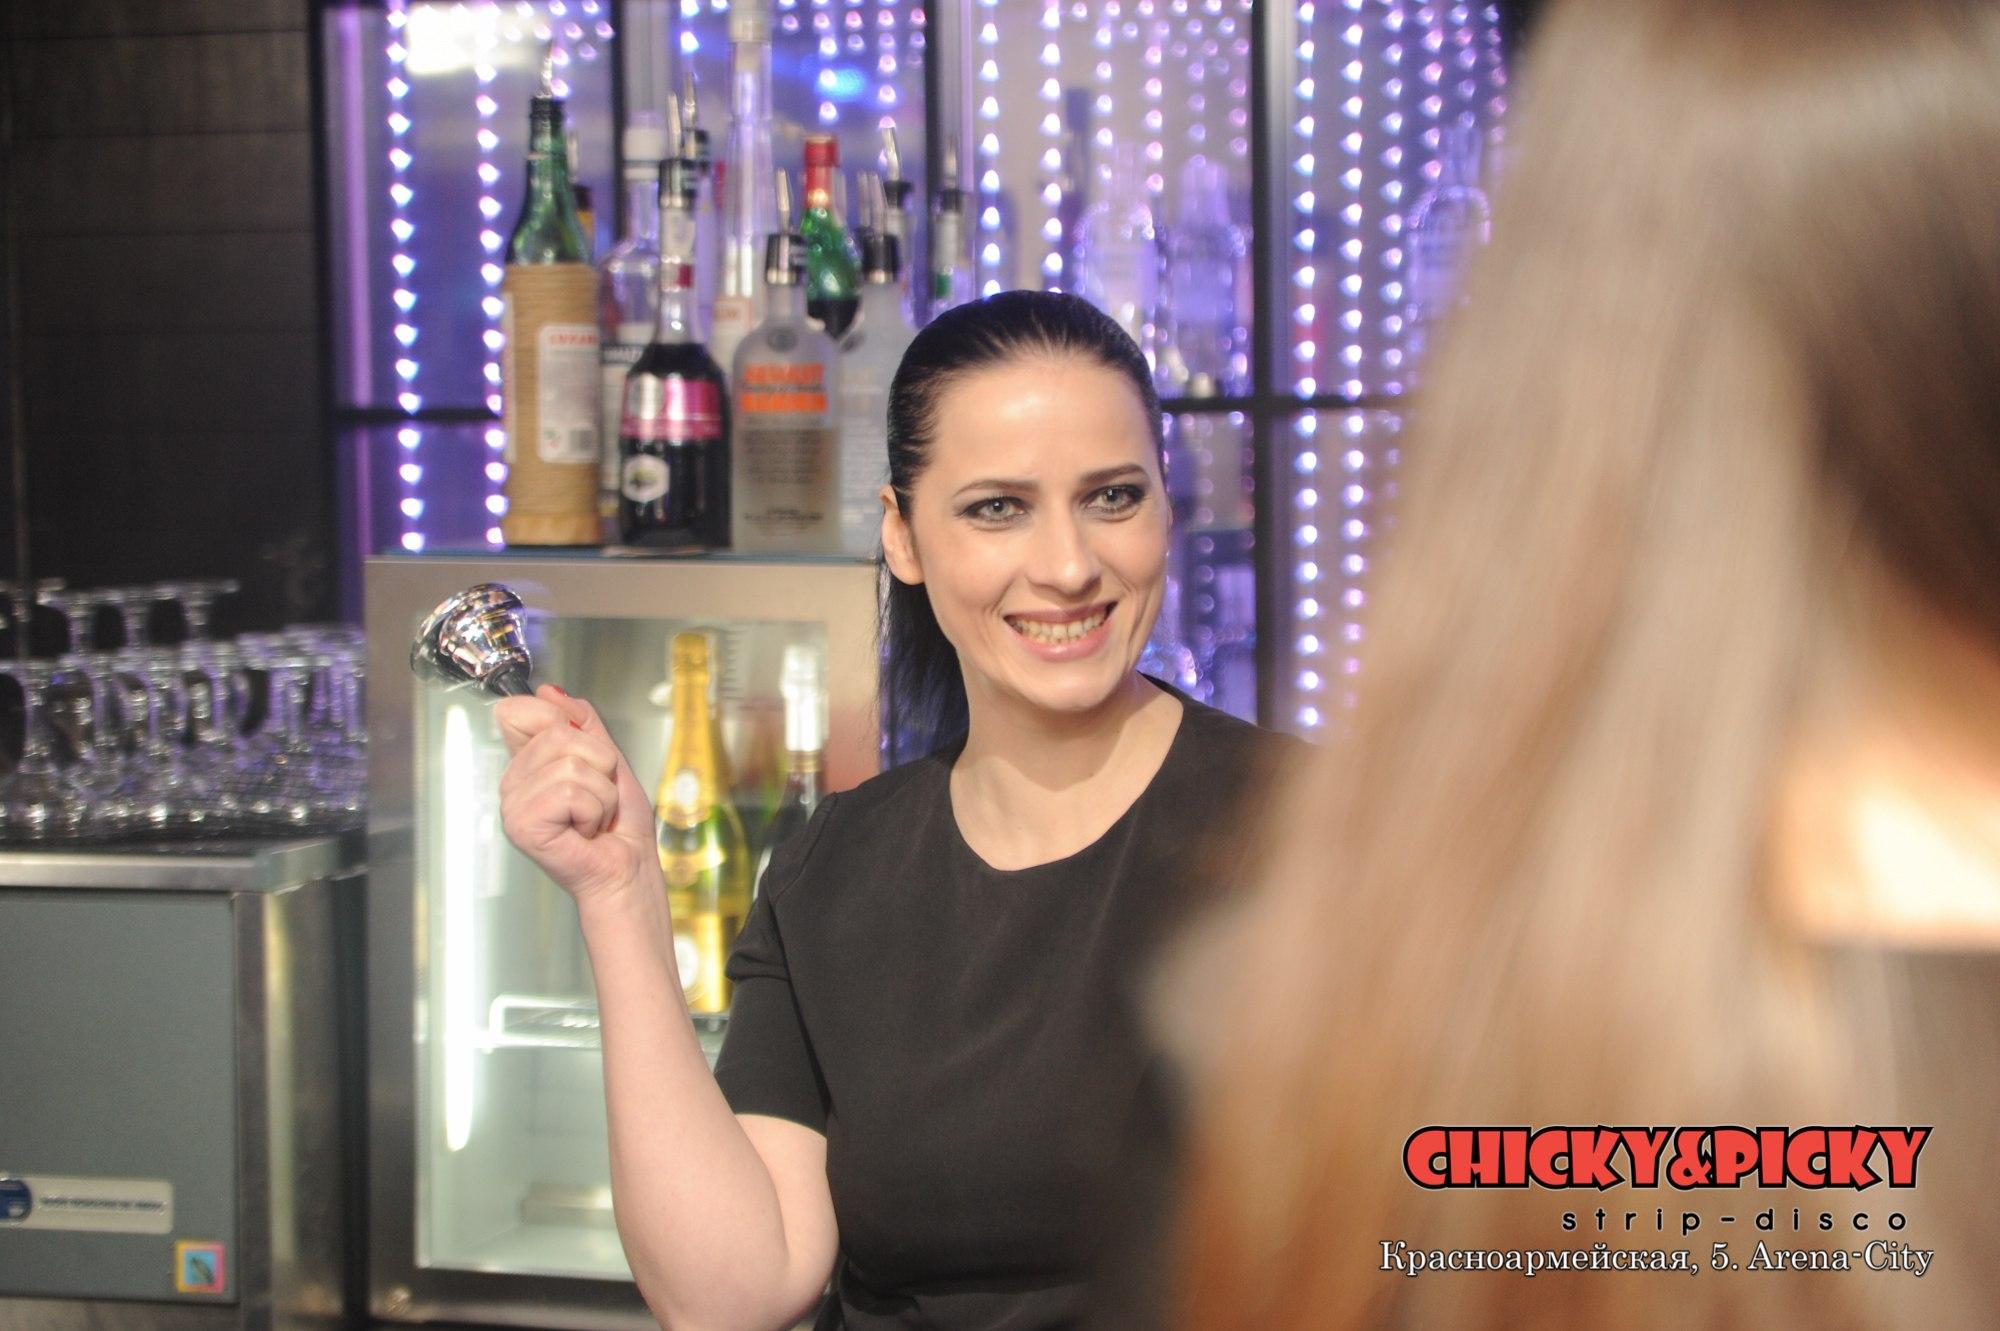 Доктор Даун Хаус в strip - disco ChickyΠcky